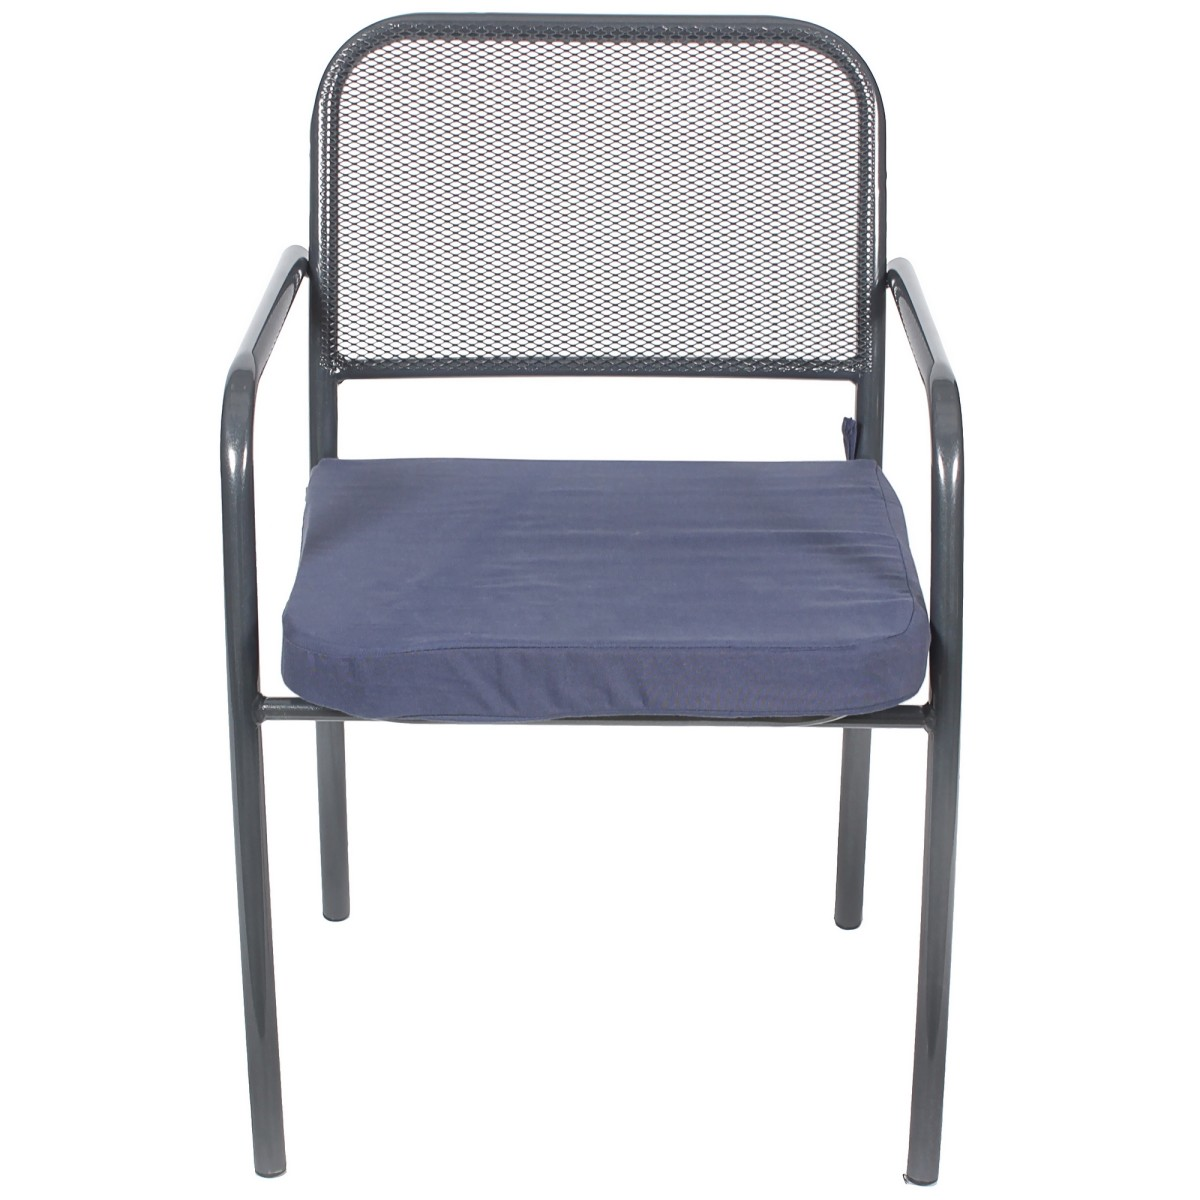 Кресло Садовое Романс 63Х54Х92 Металл Черный/Синий